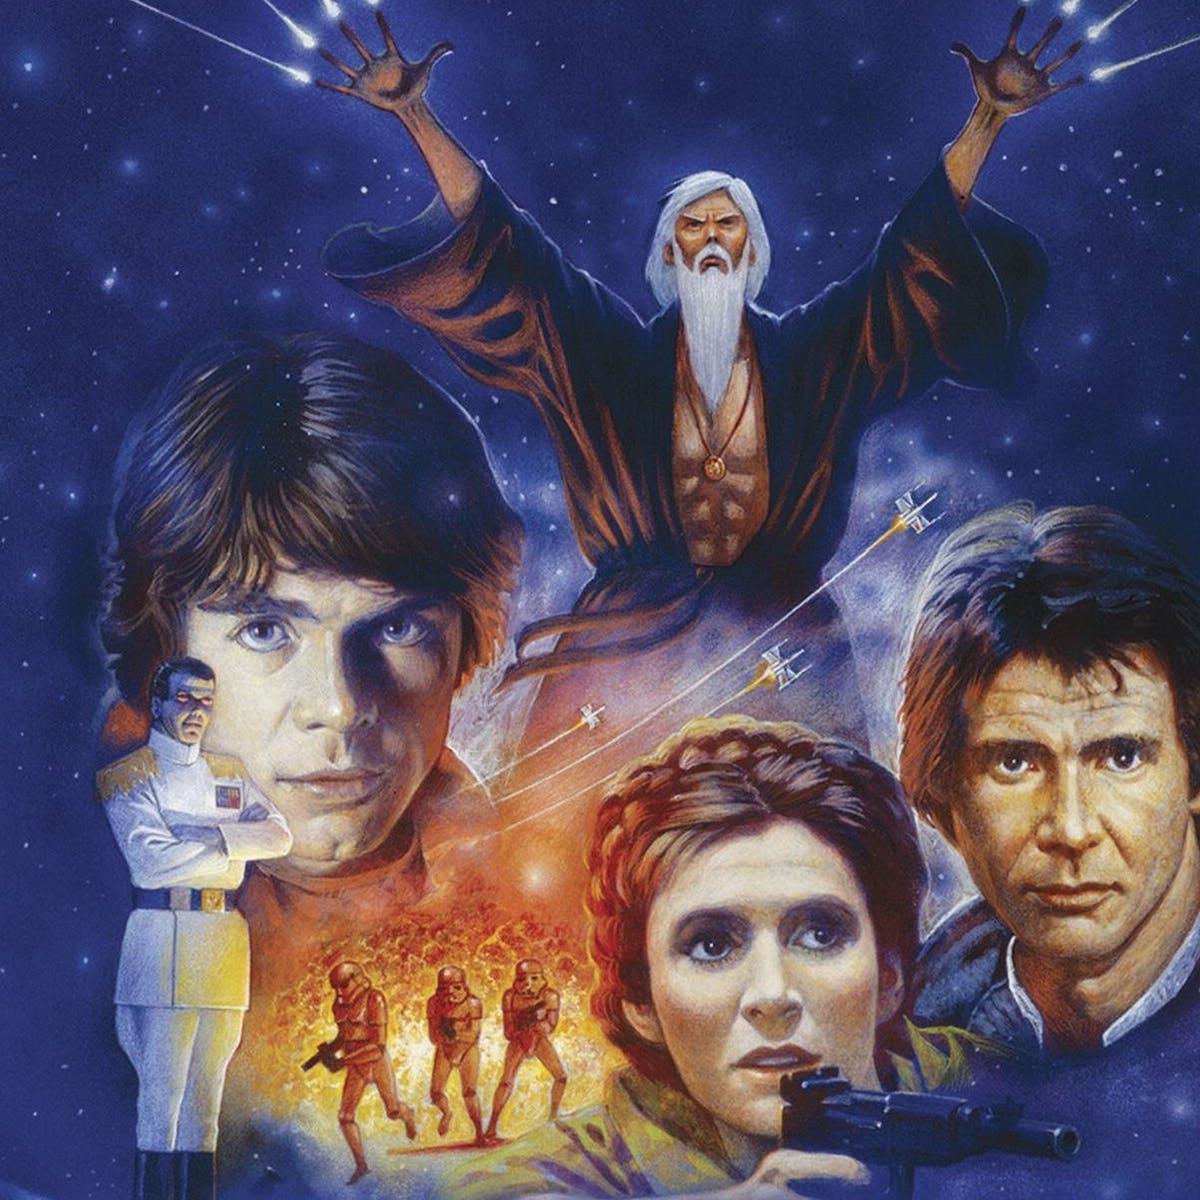 'Star Wars 9' Leaks: Sith Fleet Rumor May Bring Back a Classic EU Character